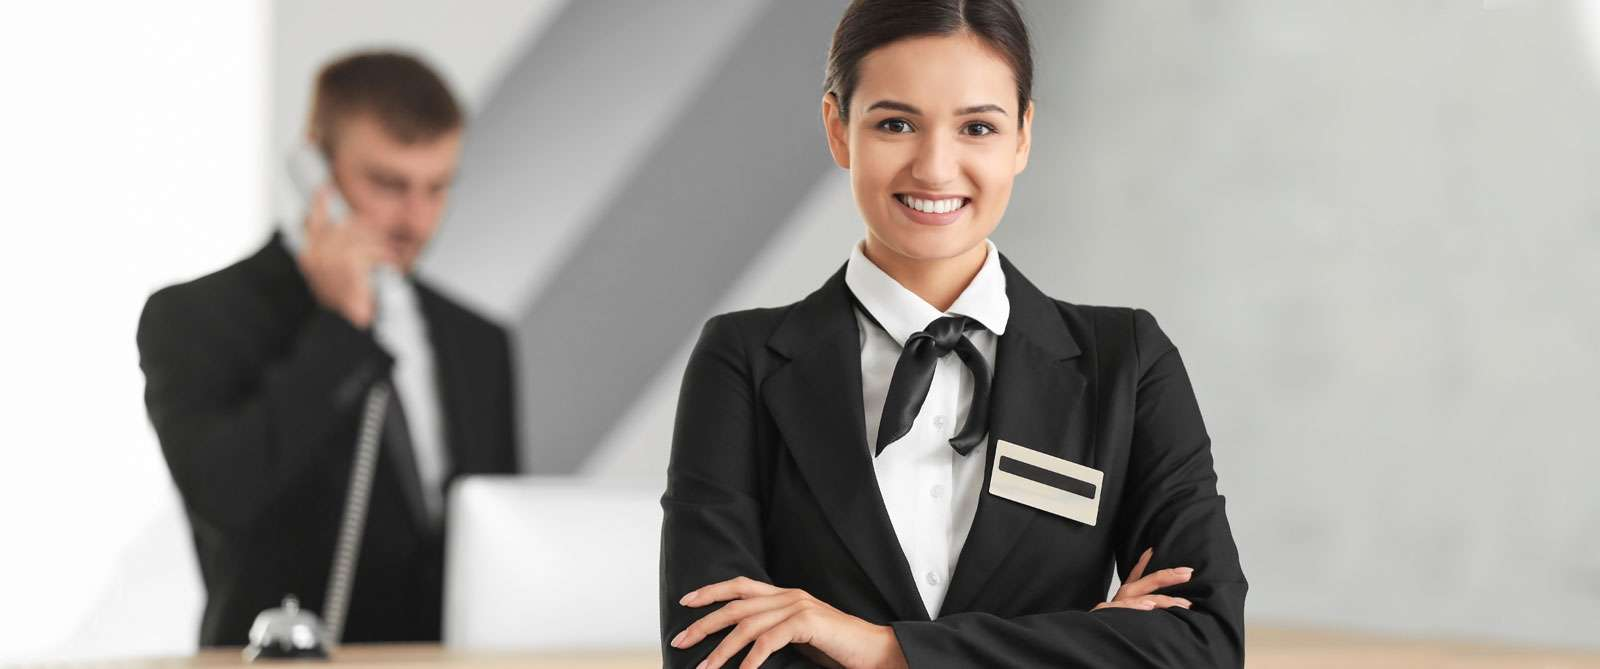 bigstock-Female-hotel-receptionist-at-w-208293751